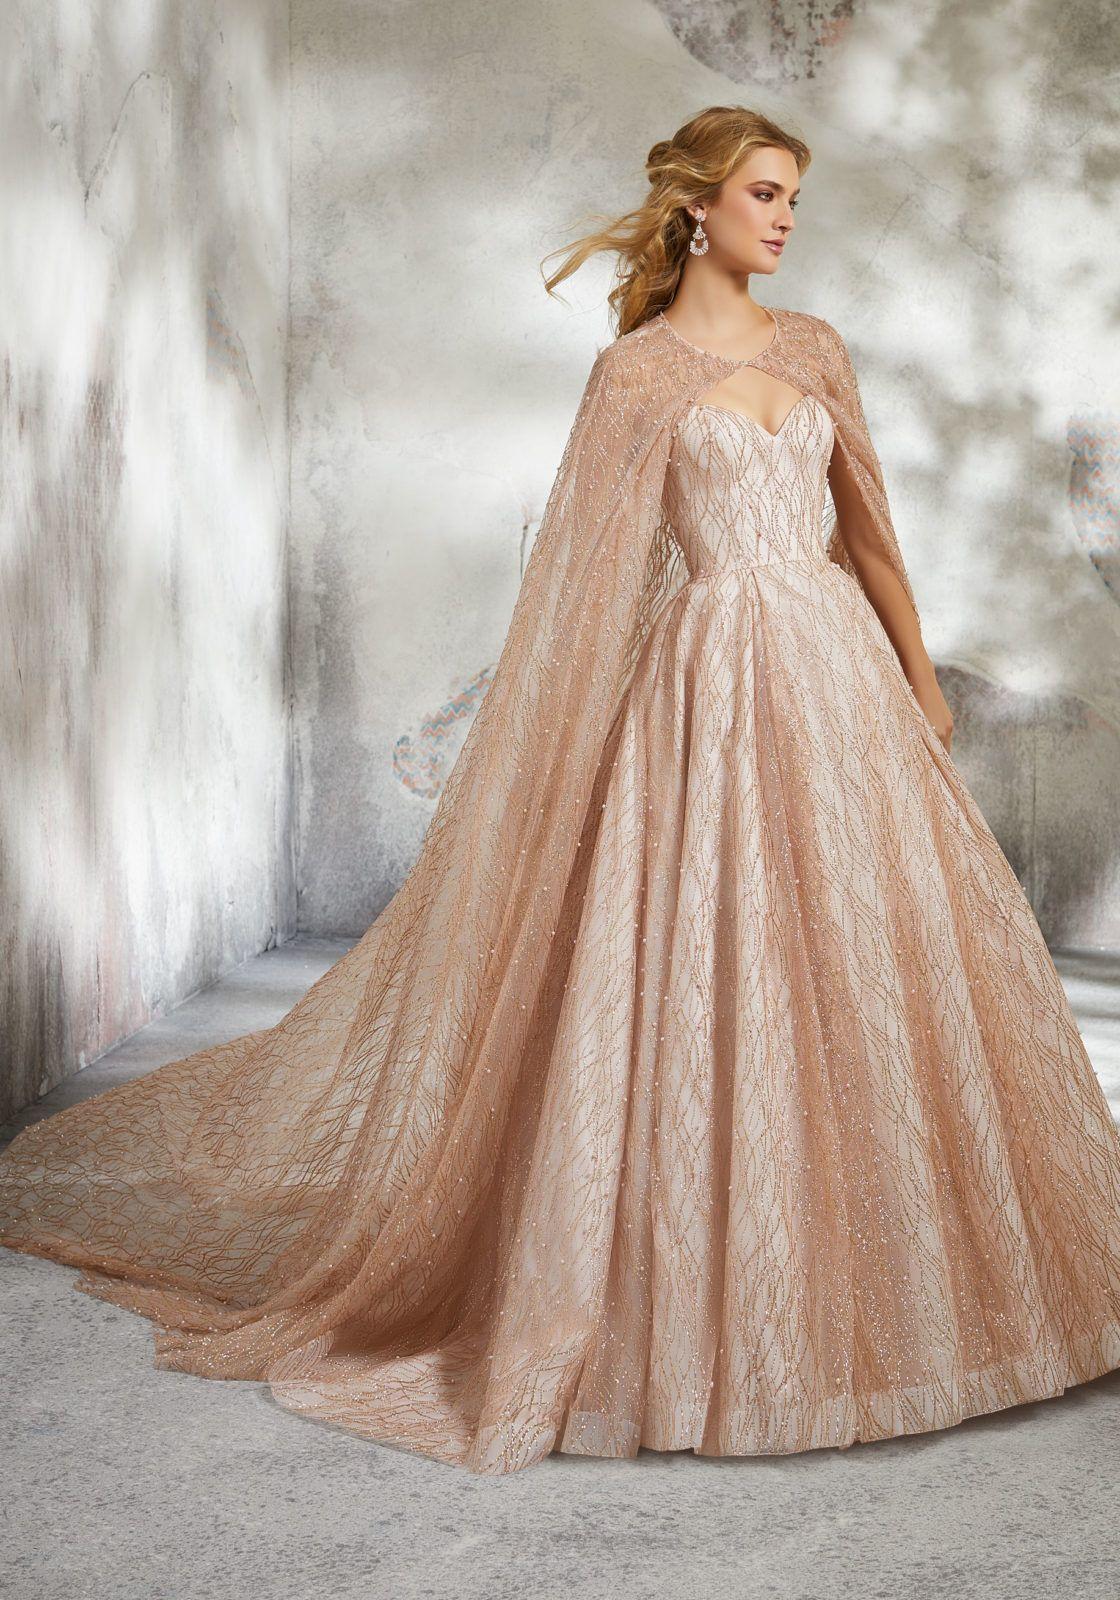 Glitter Net Cape with Pearl Detail Morilee Beautiful